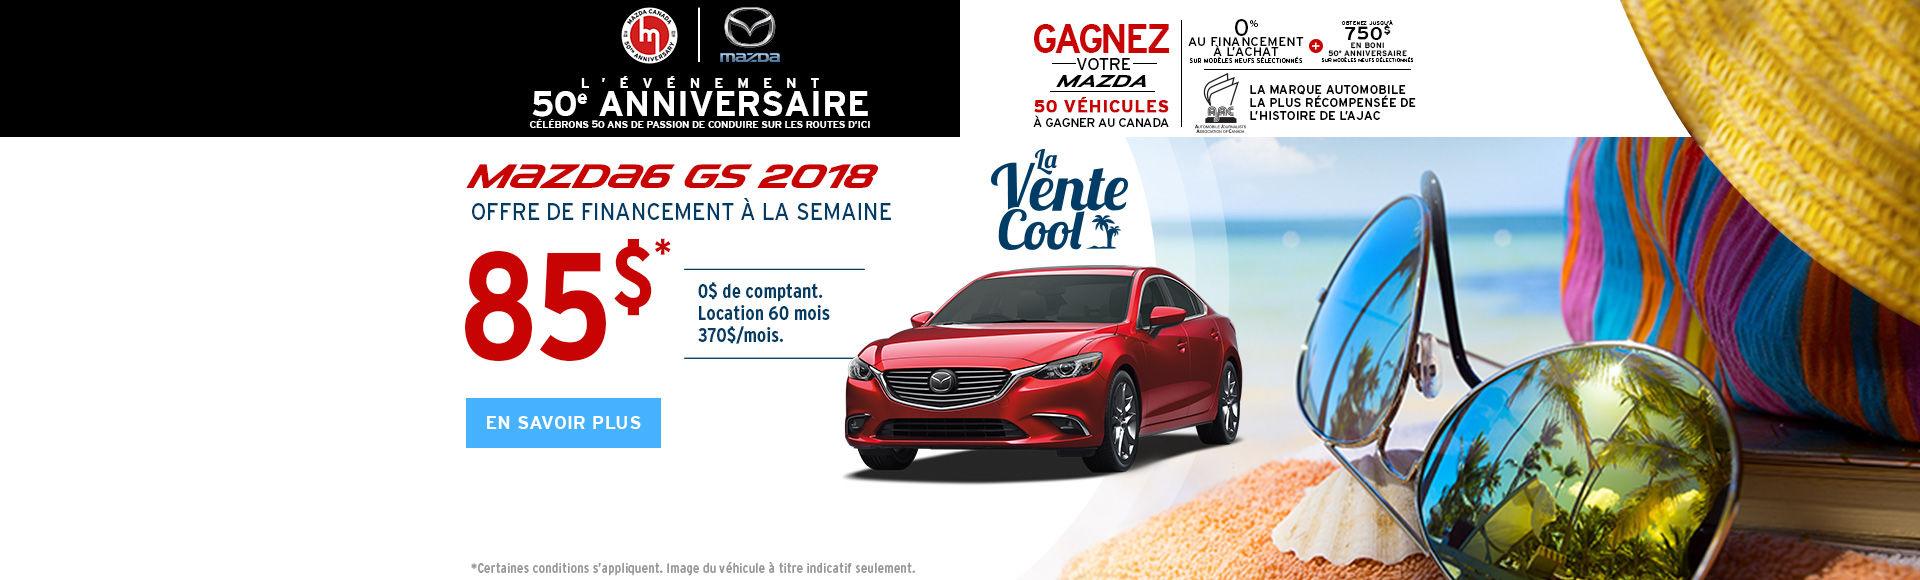 Obtenez la Mazda6 2018 - HEADERS